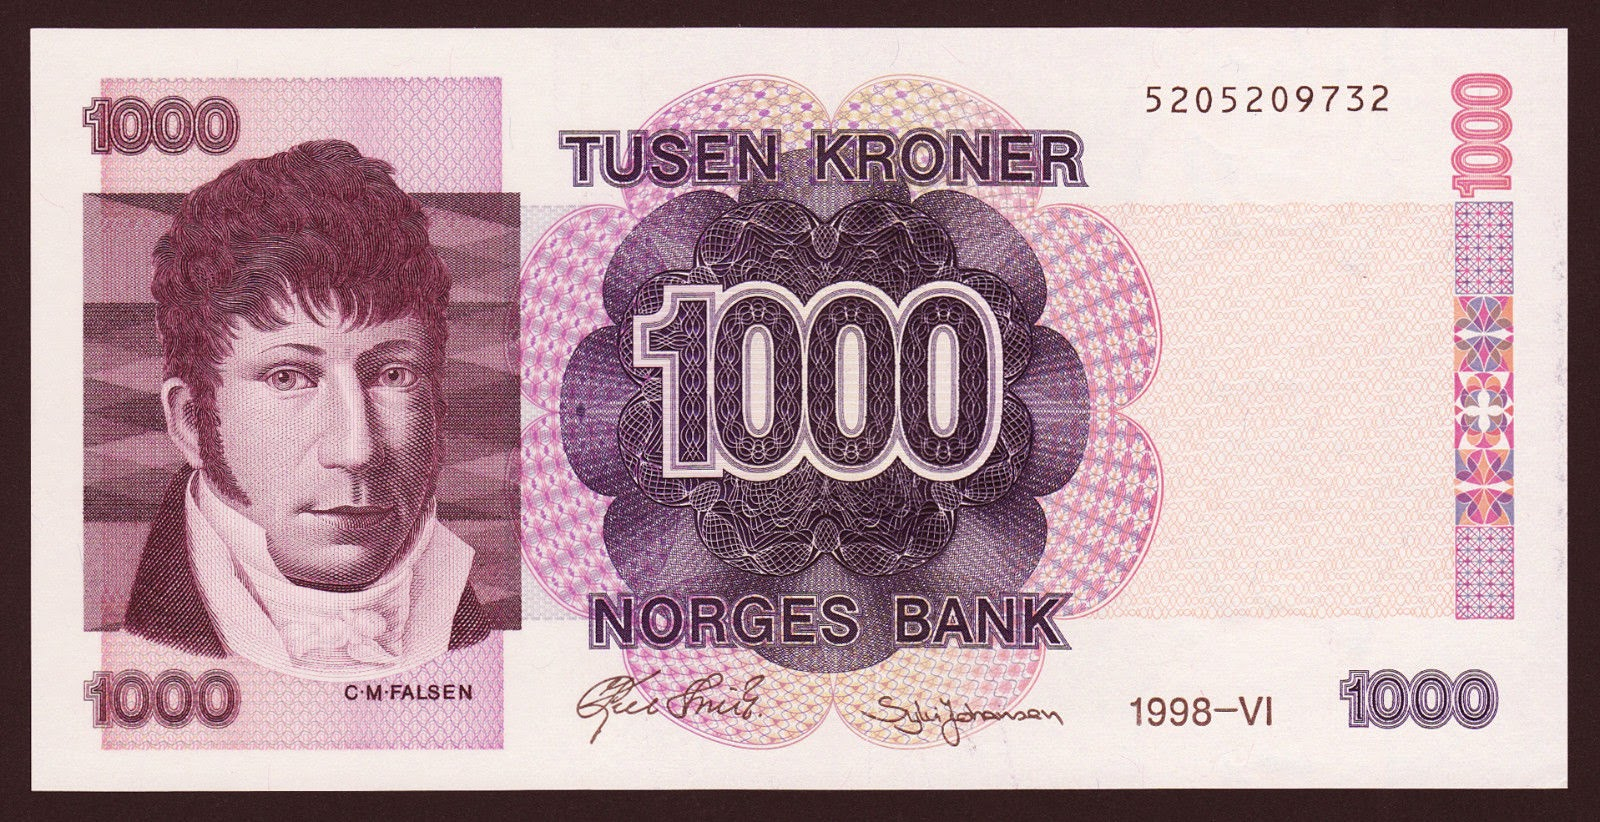 Norway Banknotes 1000 Kroner banknote 1998 Christian Magnus Falsen